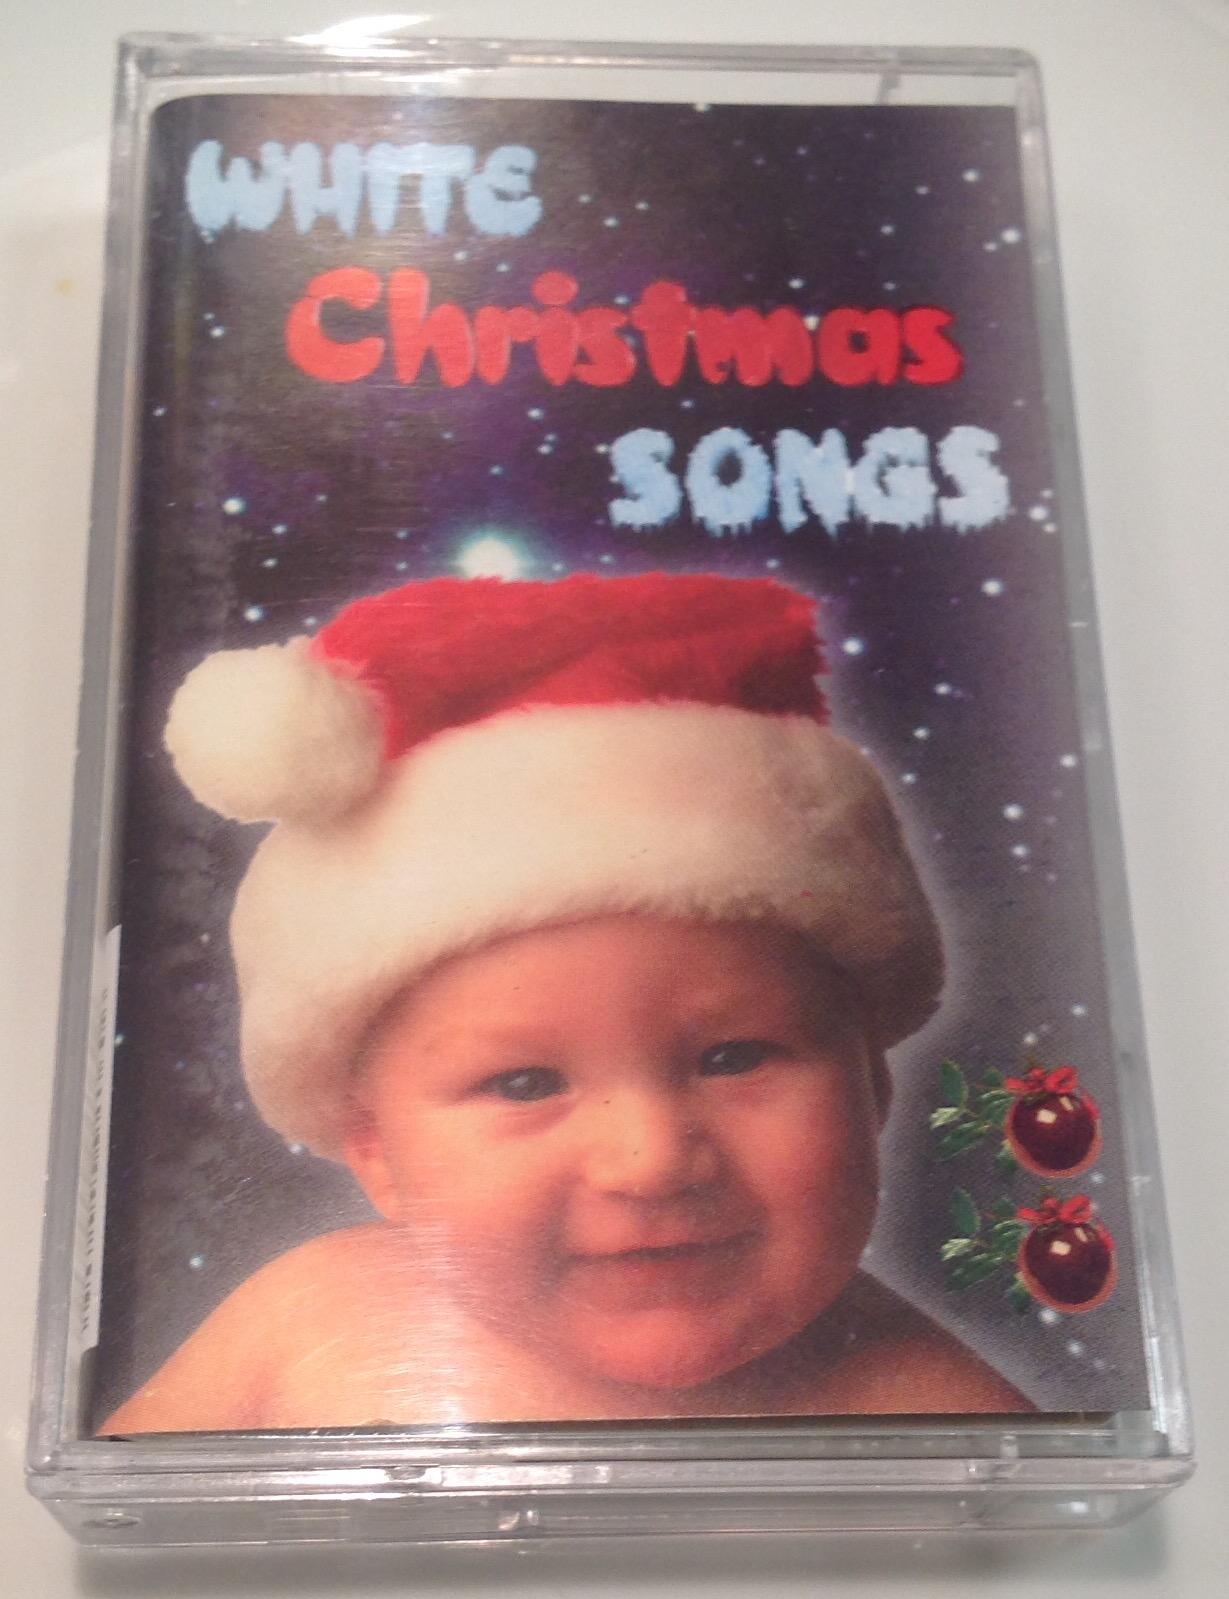 КОЛЯДКИ - WHITE CHRISTMAS SONGS /КАССЕТА/АУДИО доставка товаров из Польши и Allegro на русском